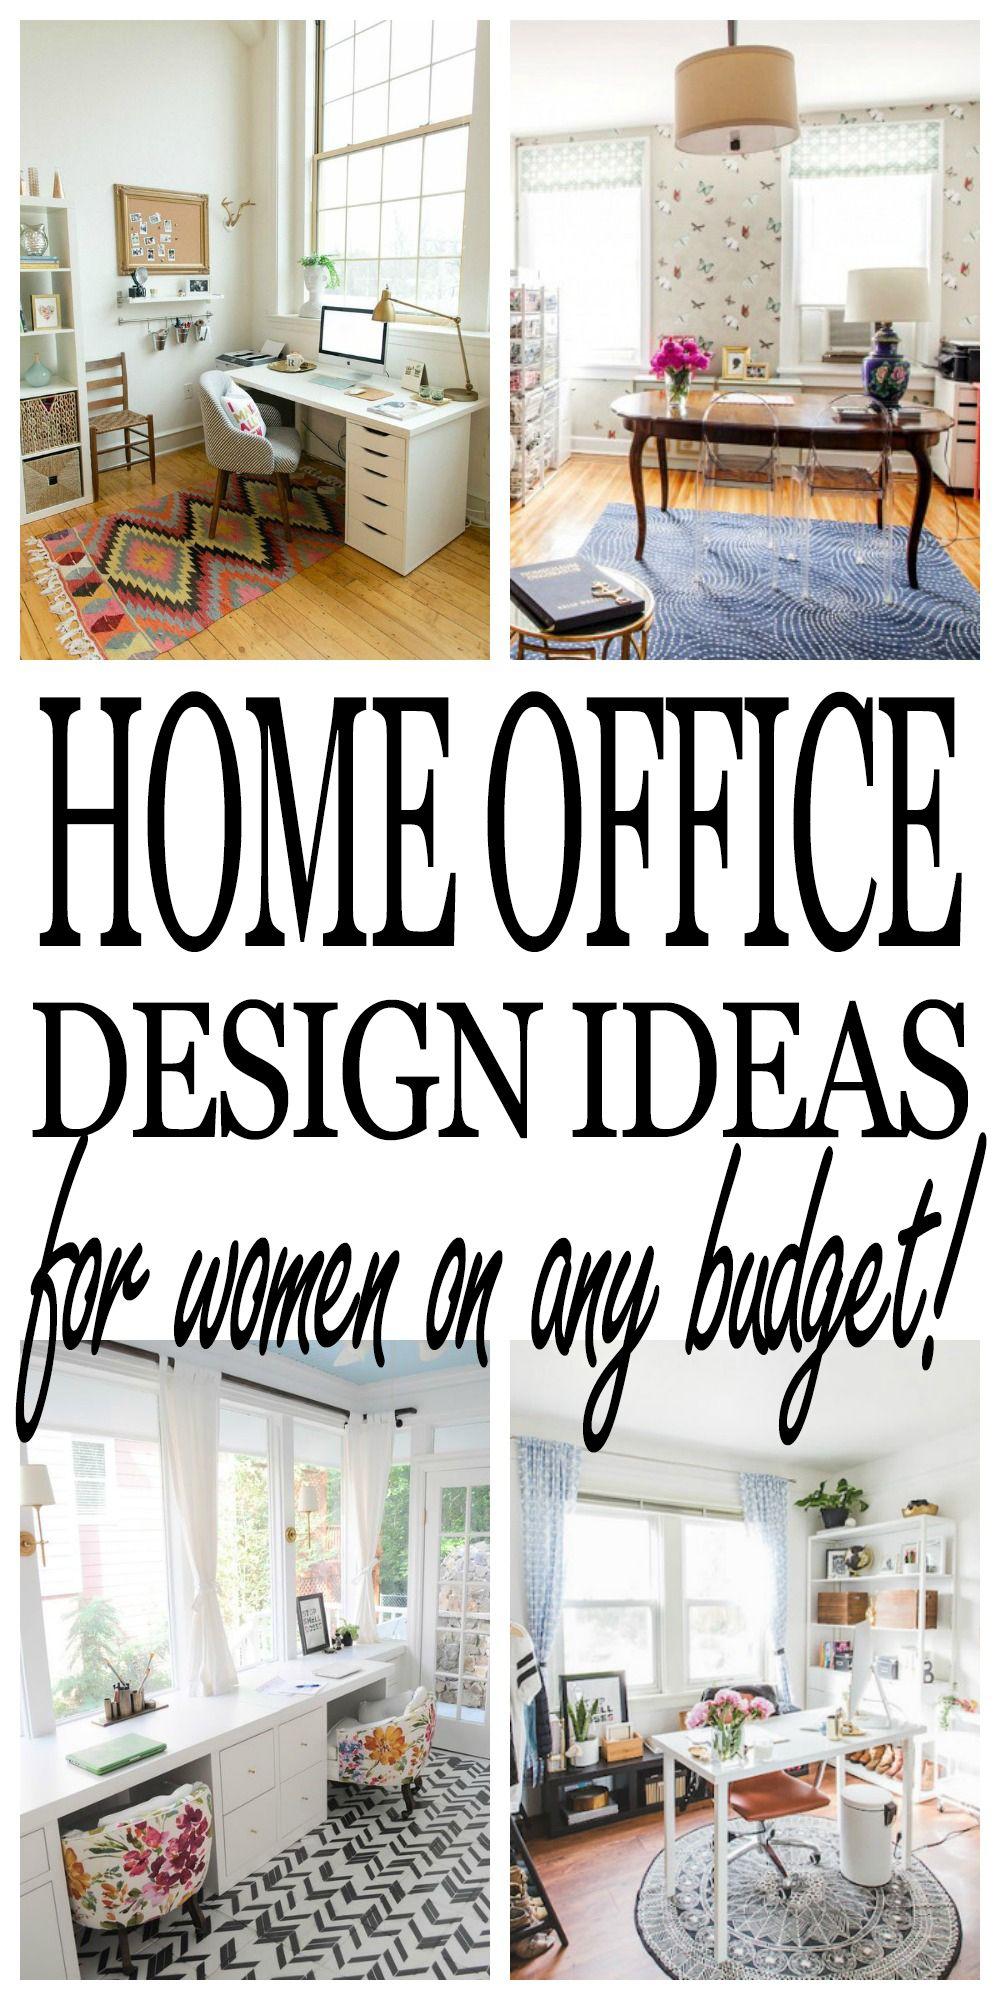 Inspiring Ideas for a Girl Boss\'s Desk and Home Office | Desks ...